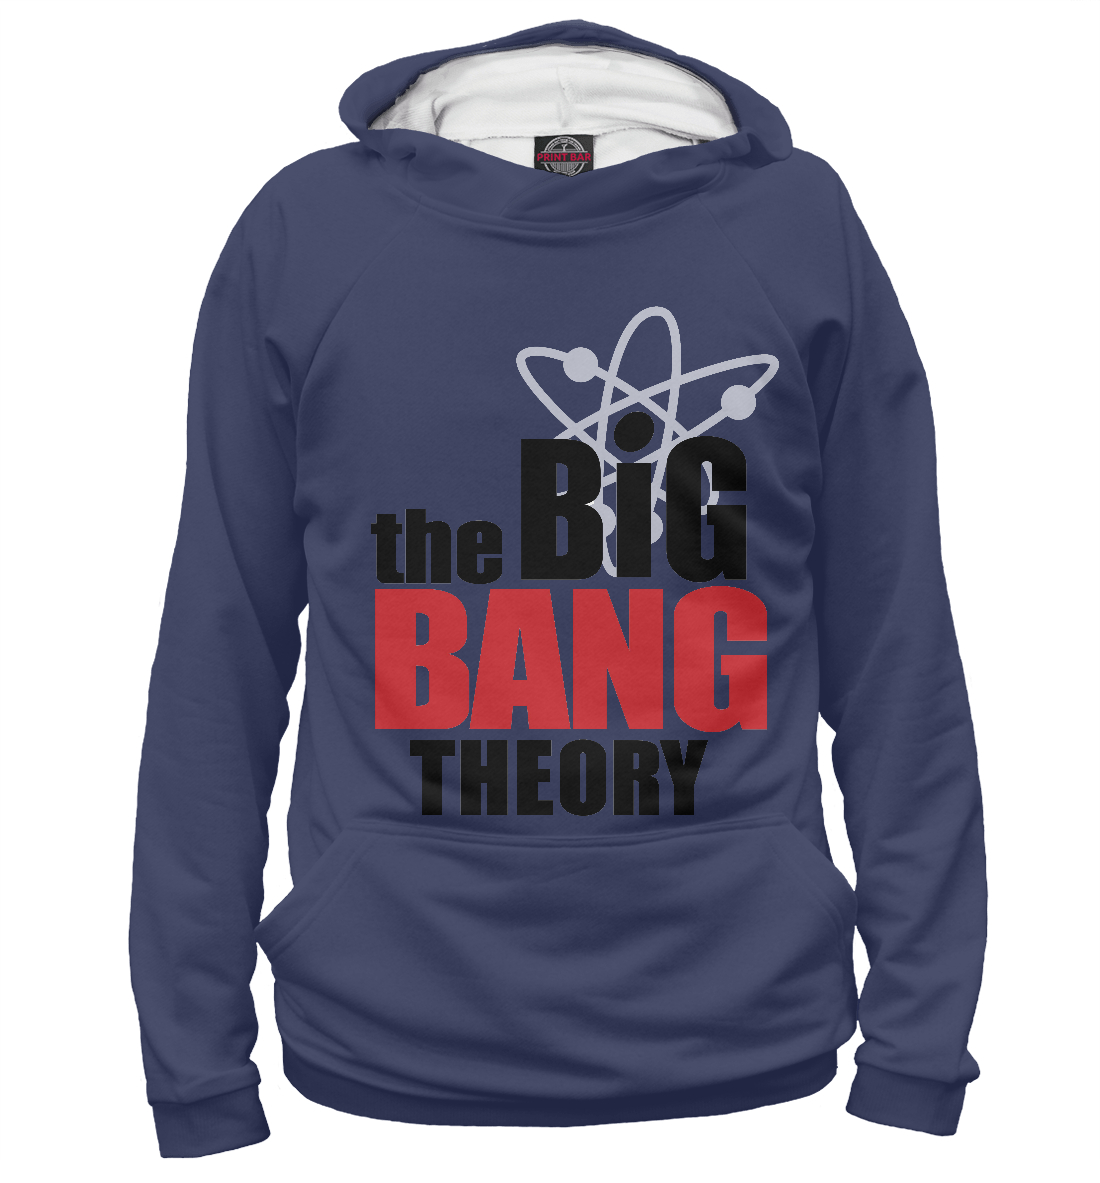 Купить The Big Bang Theory, Printbar, Худи, TEO-696949-hud-2